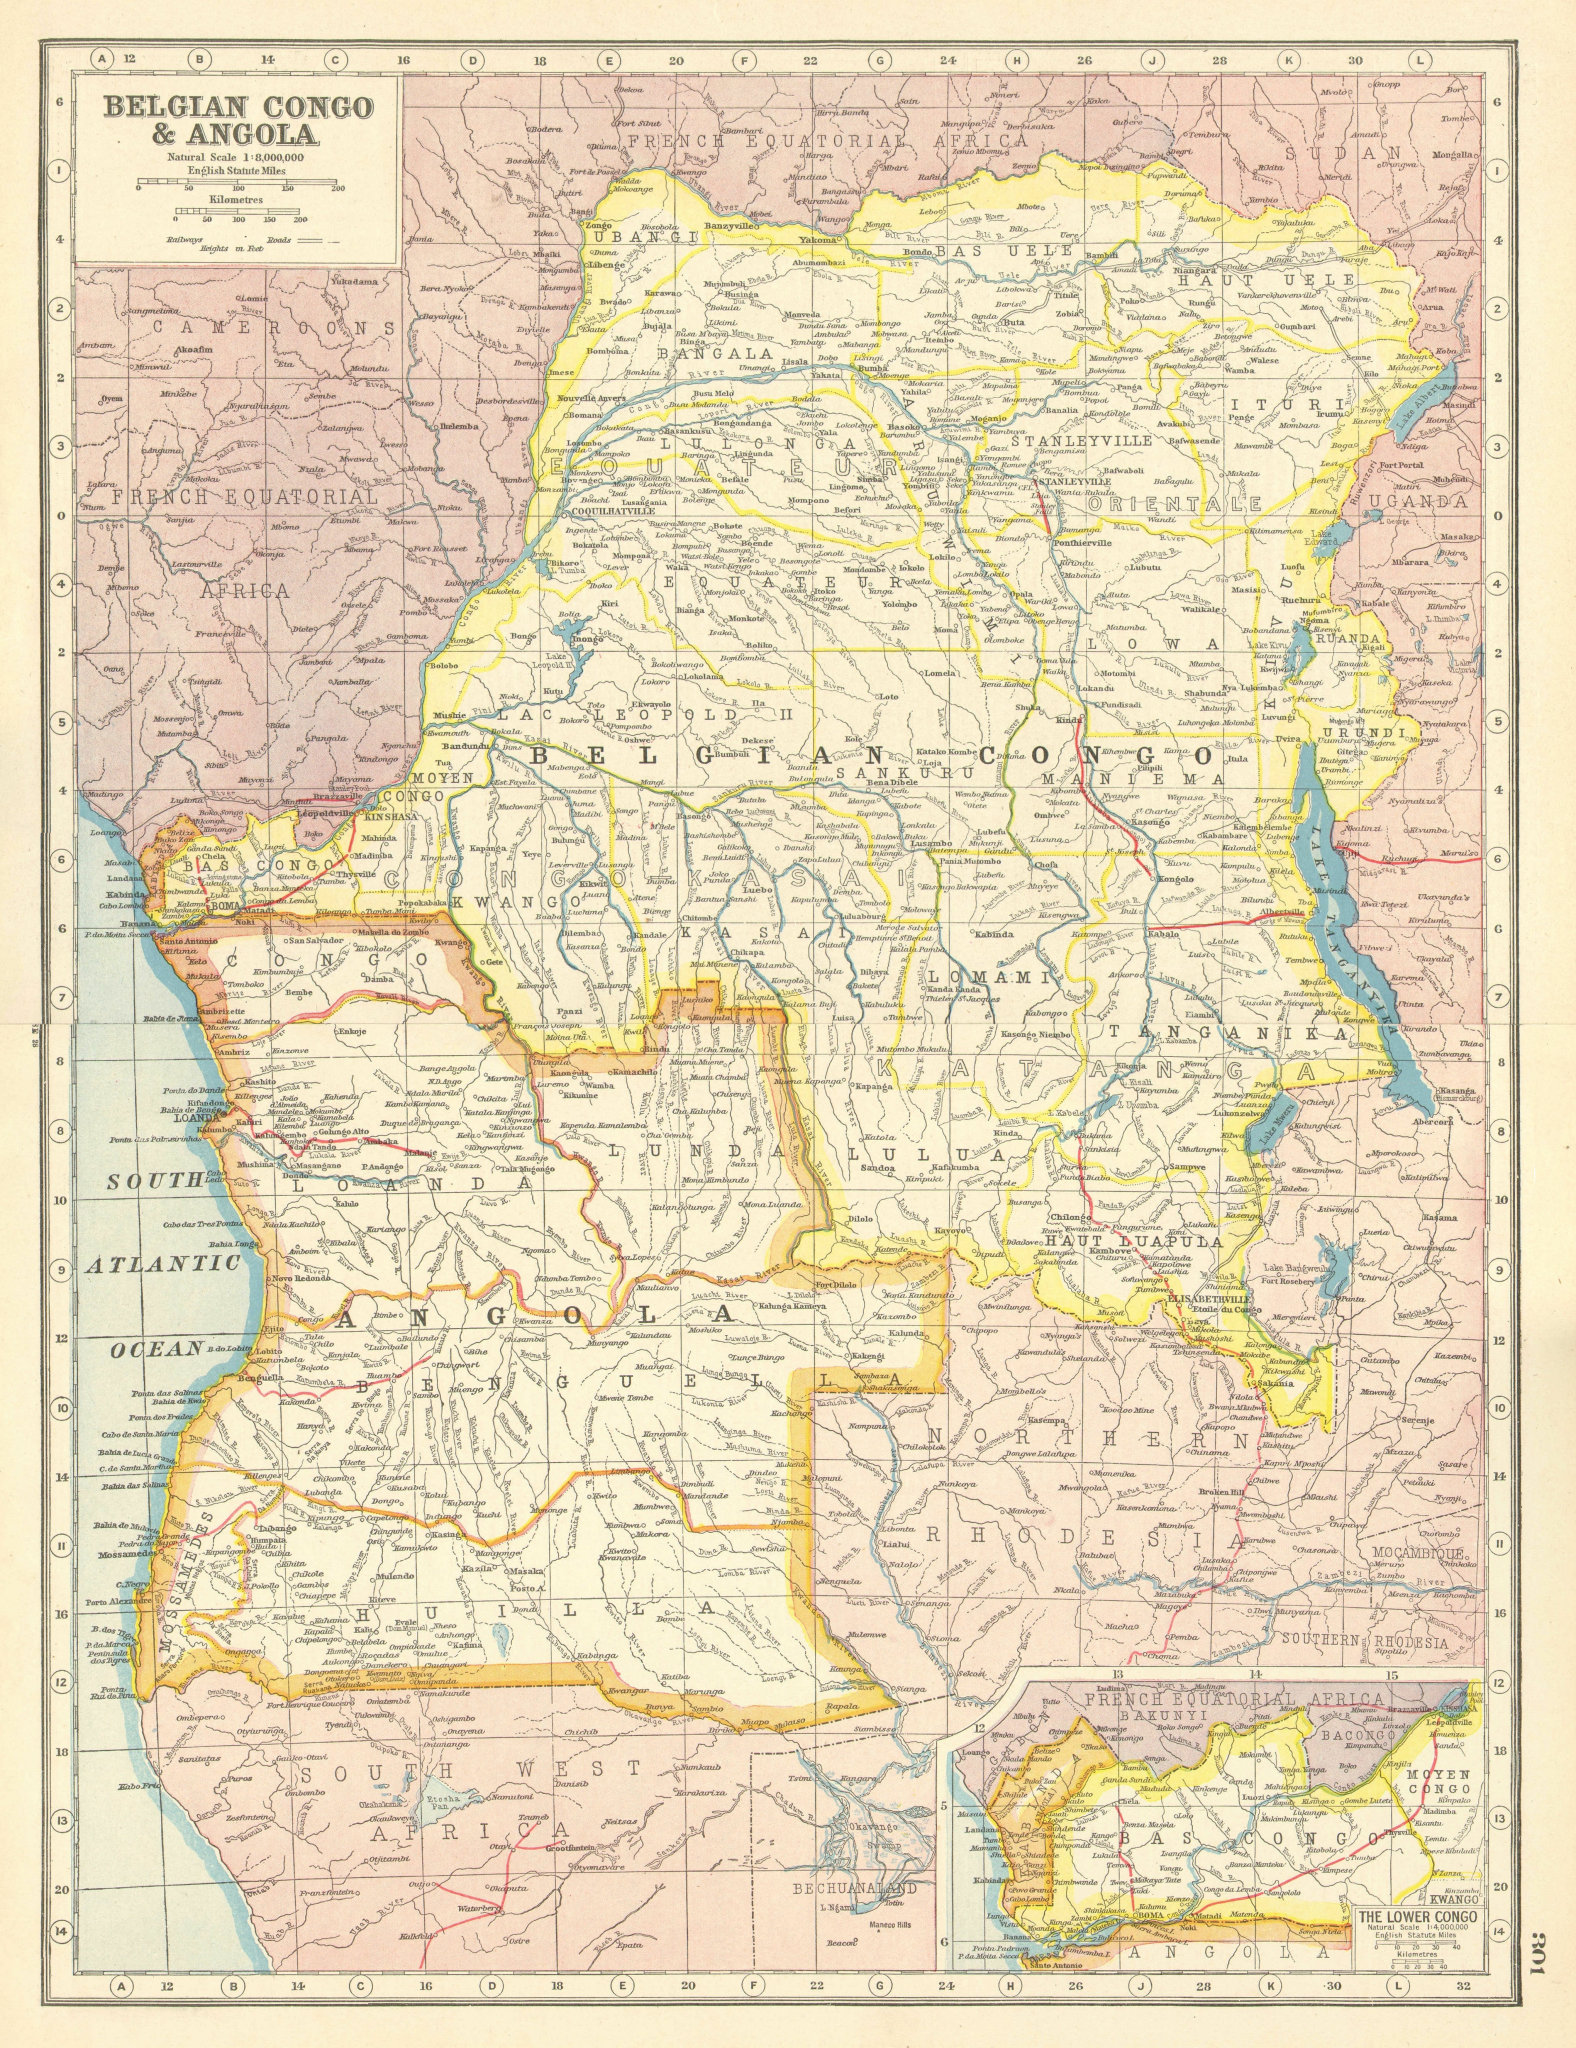 Associate Product BELGIAN CONGO/ANGOLA. South West Africa Railways Provinces. HARMSWORTH 1920 map